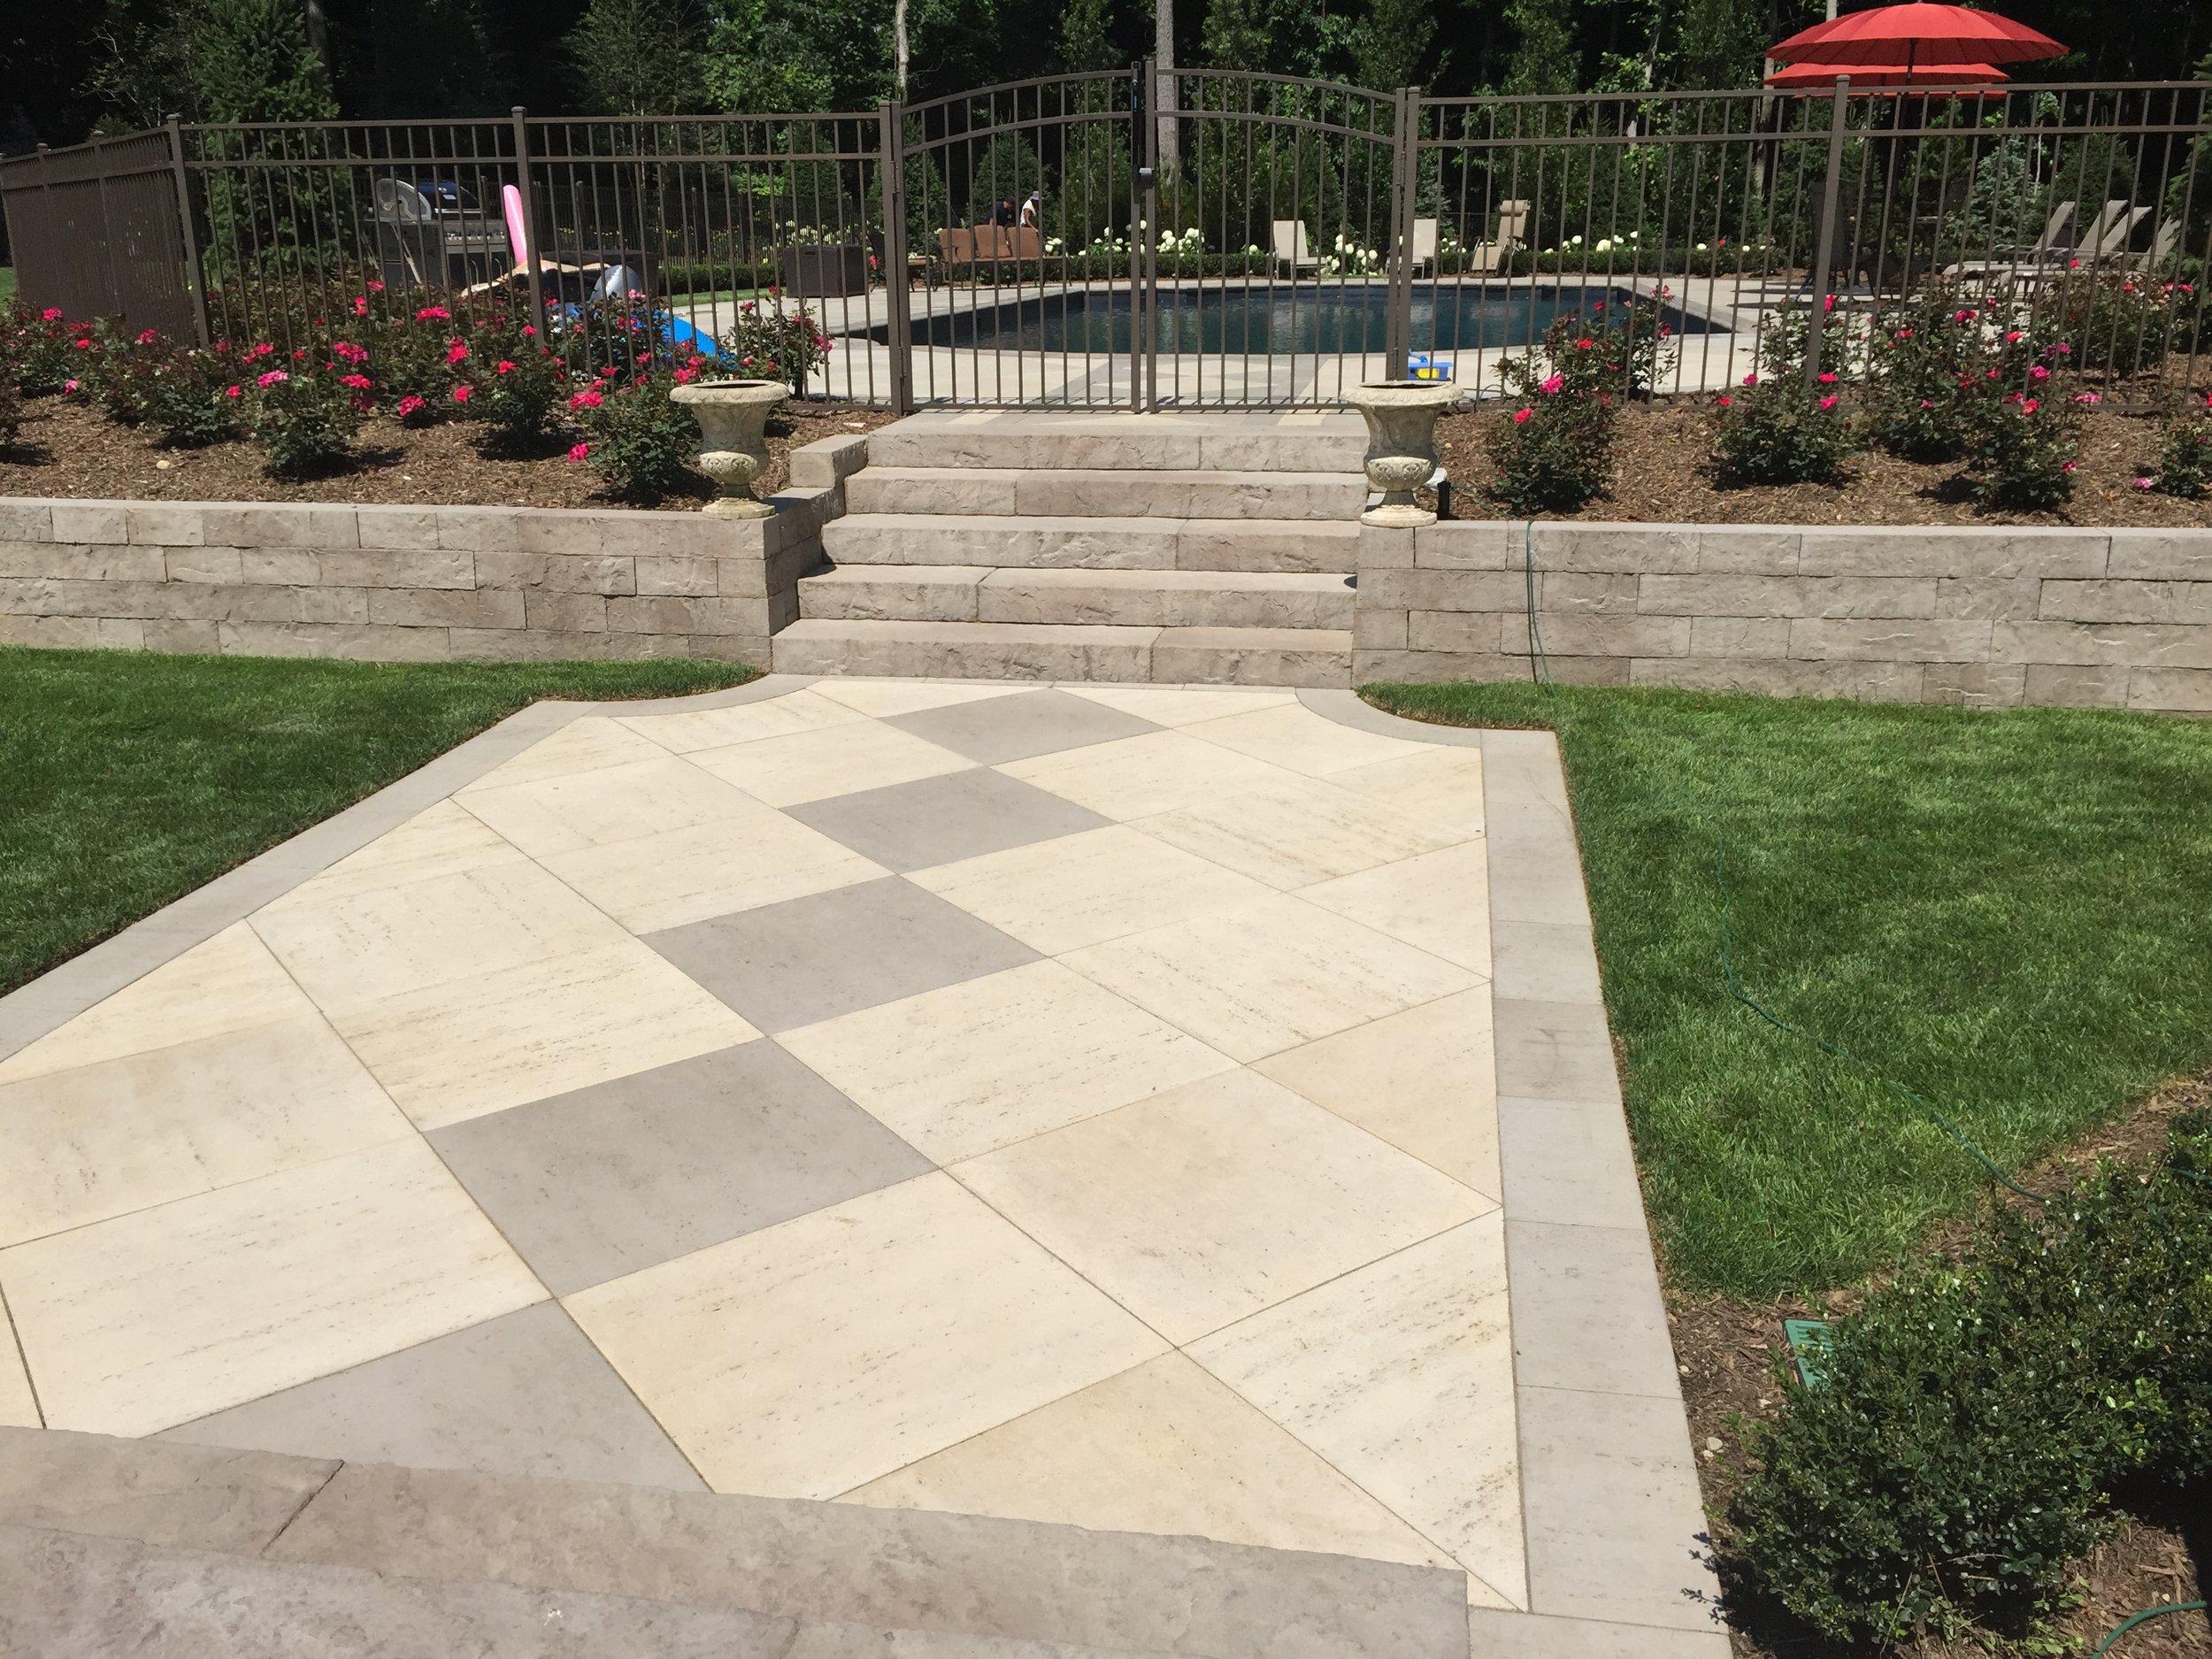 Custom walkway paver design company in Long Island, NY